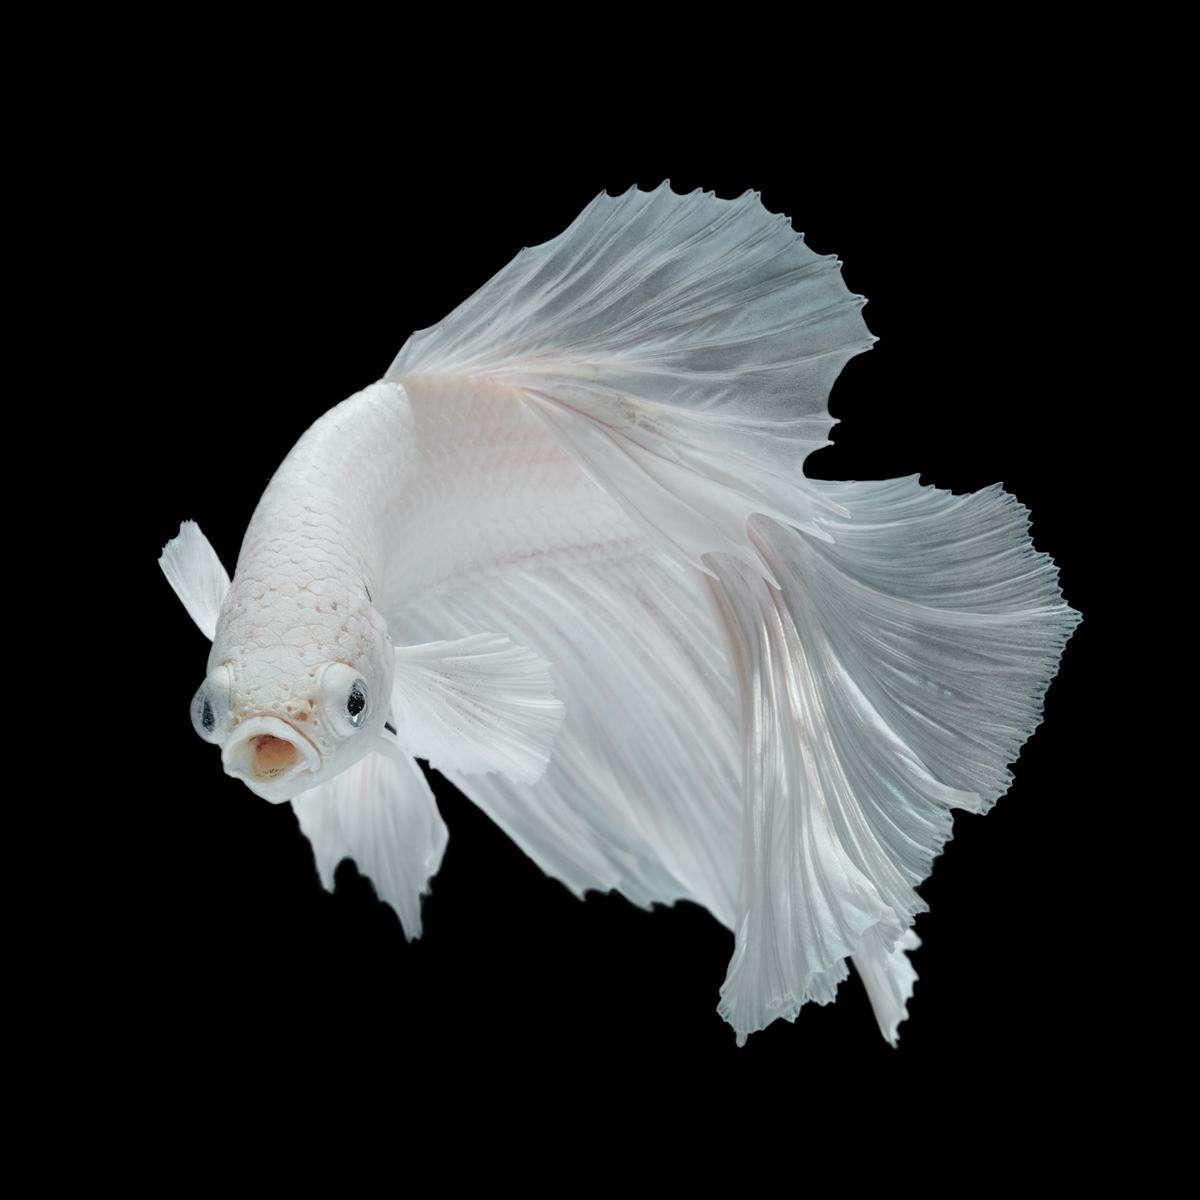 white opal betta fighting siamese fish